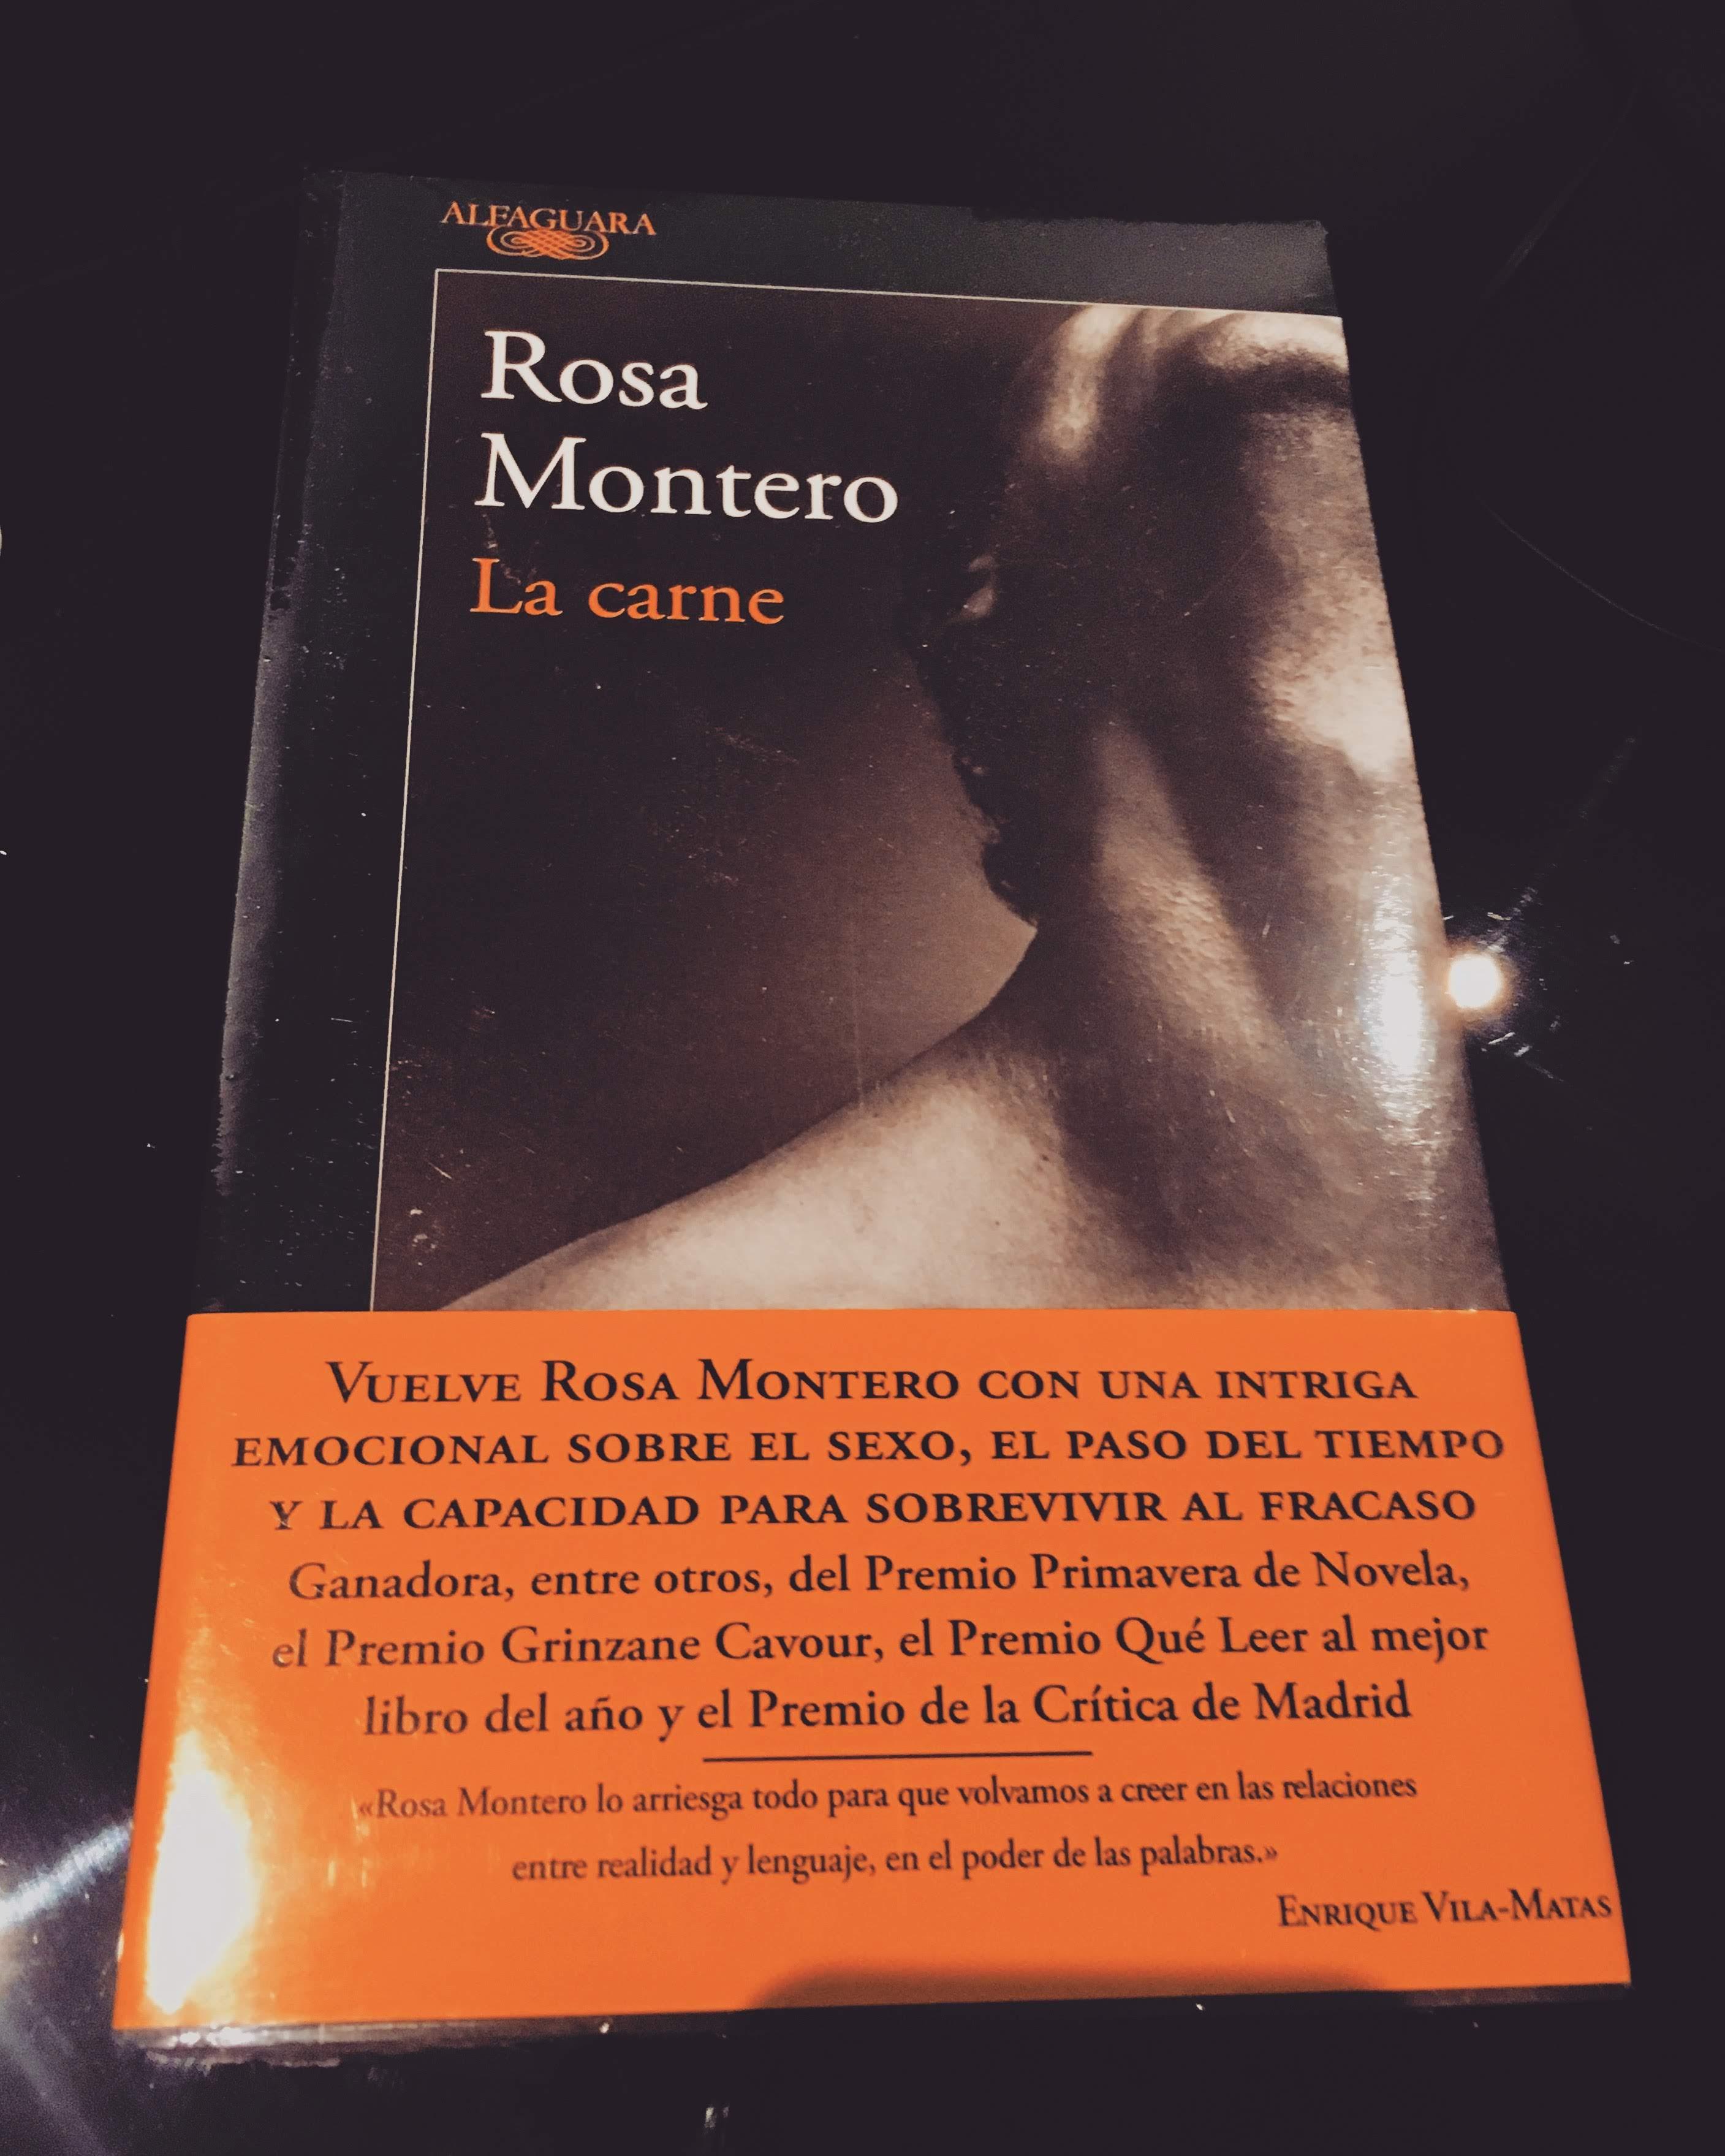 Portada del Libro La carne de la autora española Rosa Montero. (Foto: Sandra Ramírez Checnes)